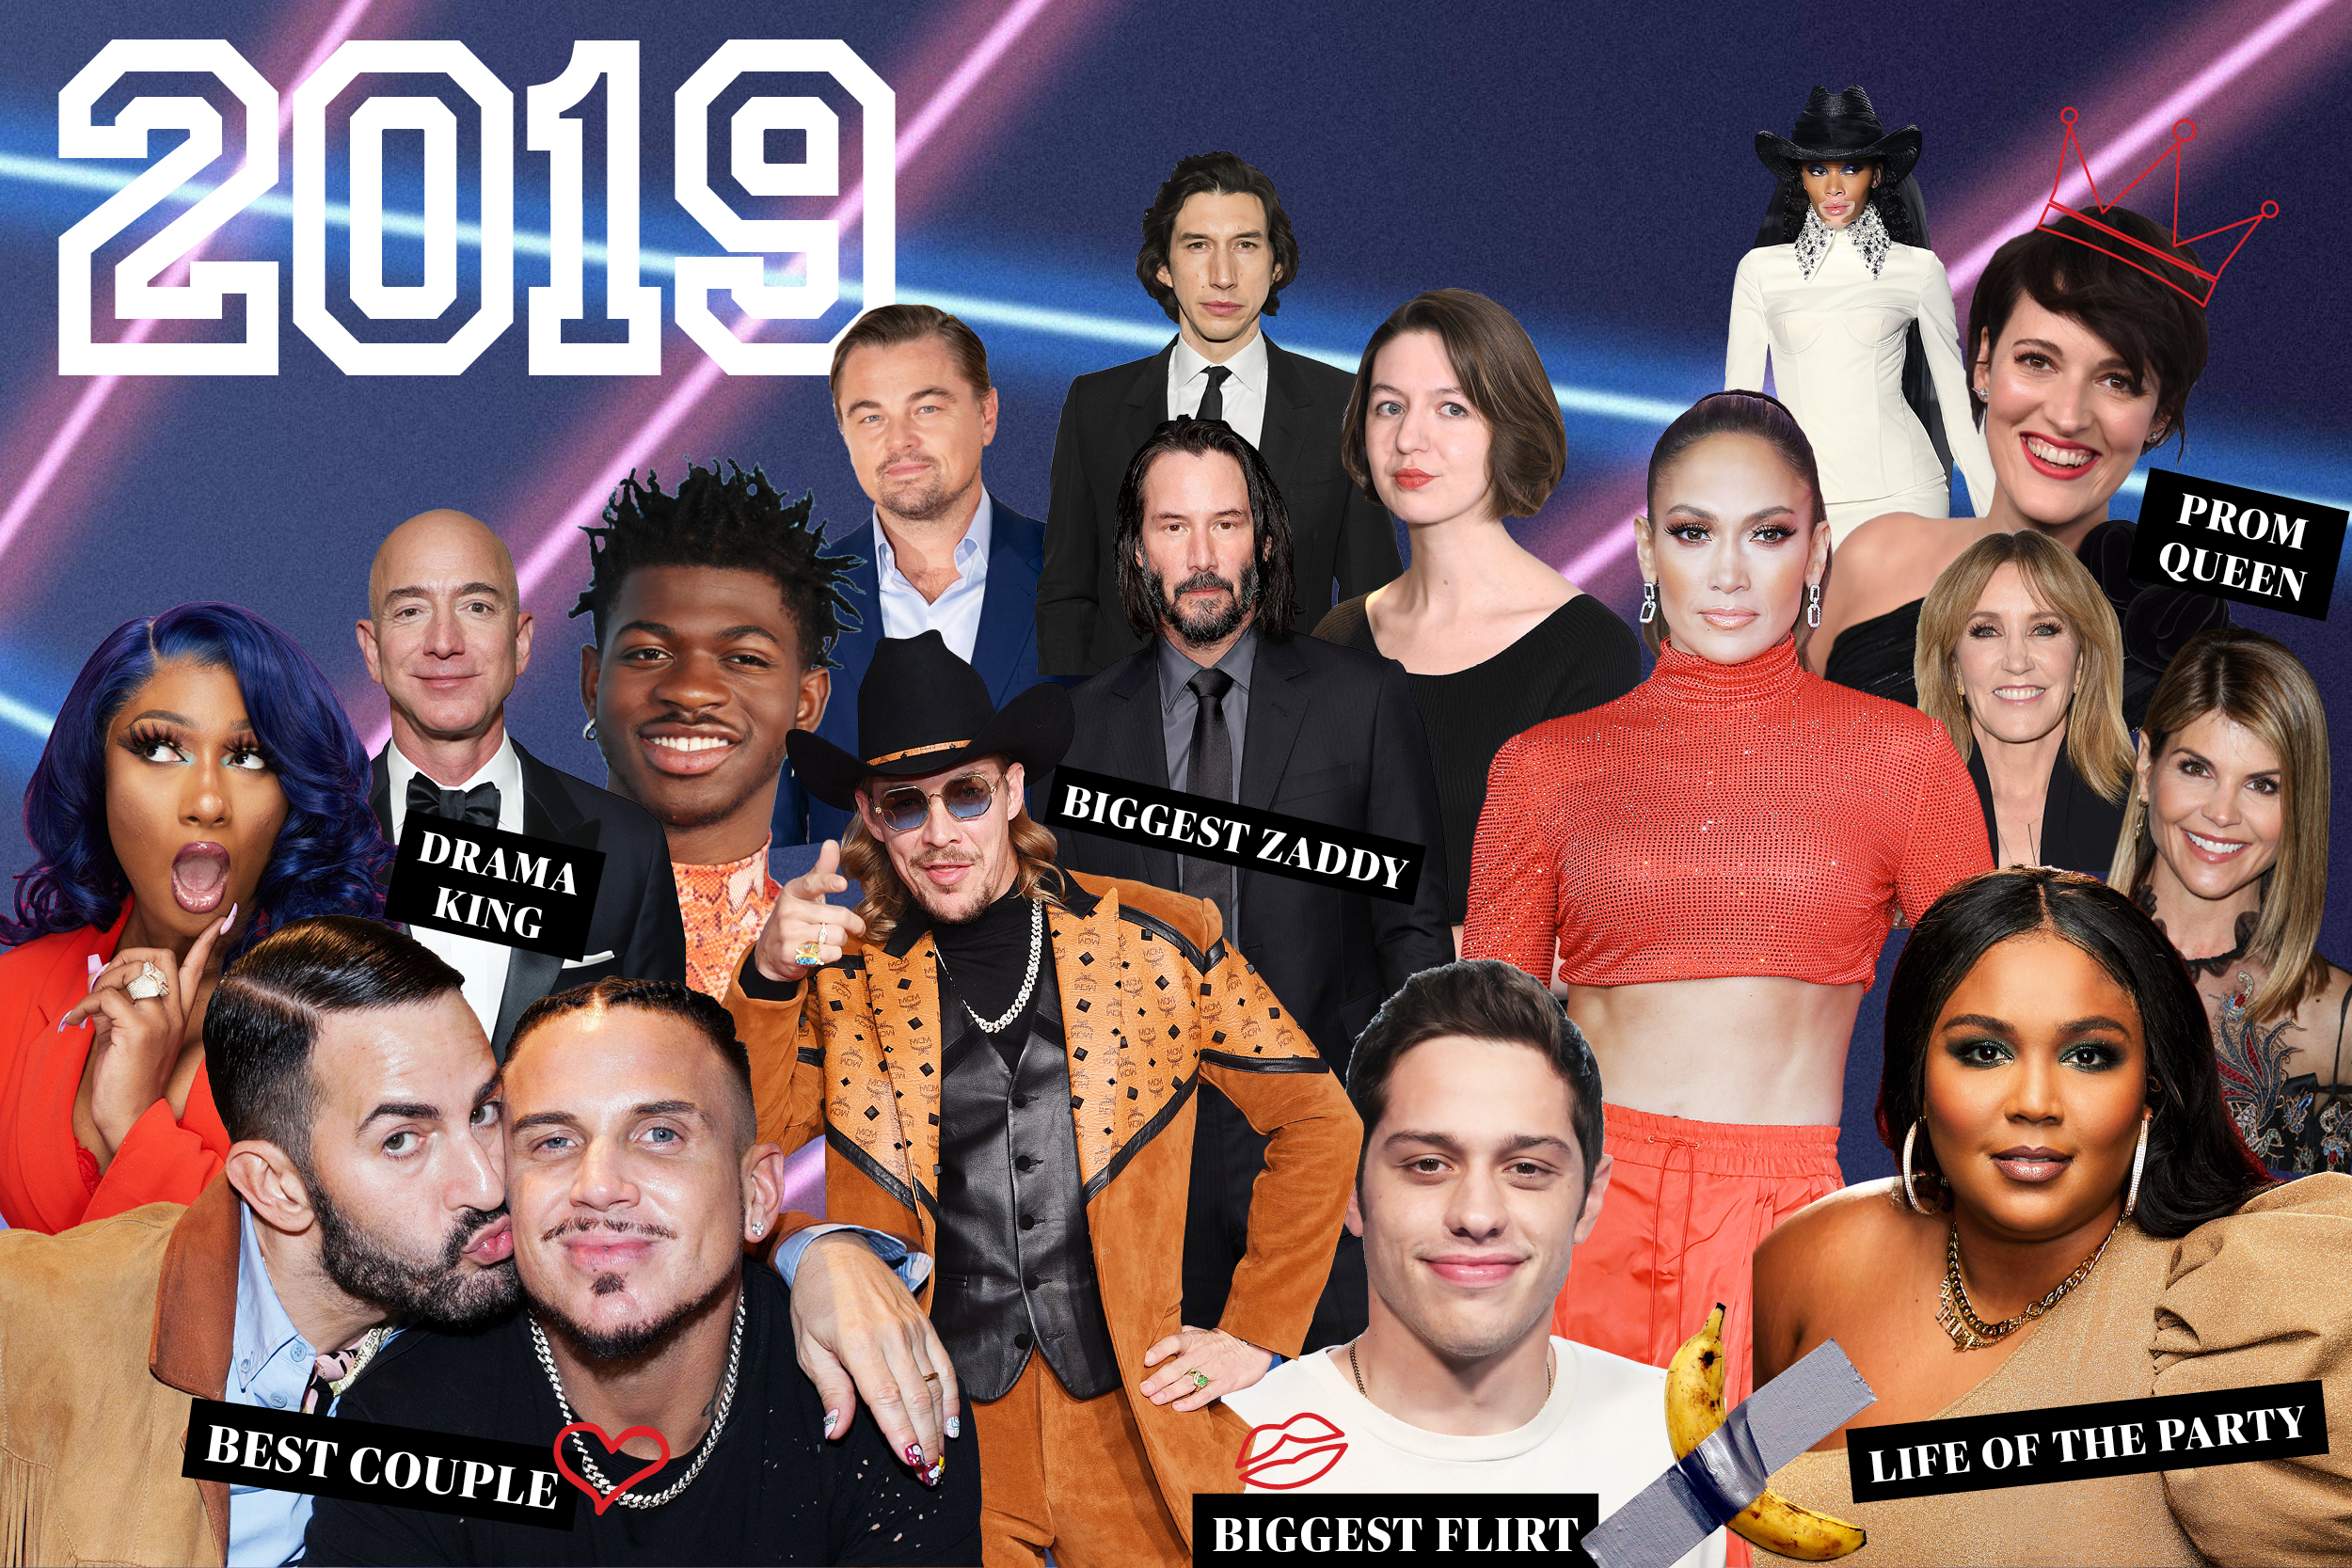 WWD's 2019 Superlatives